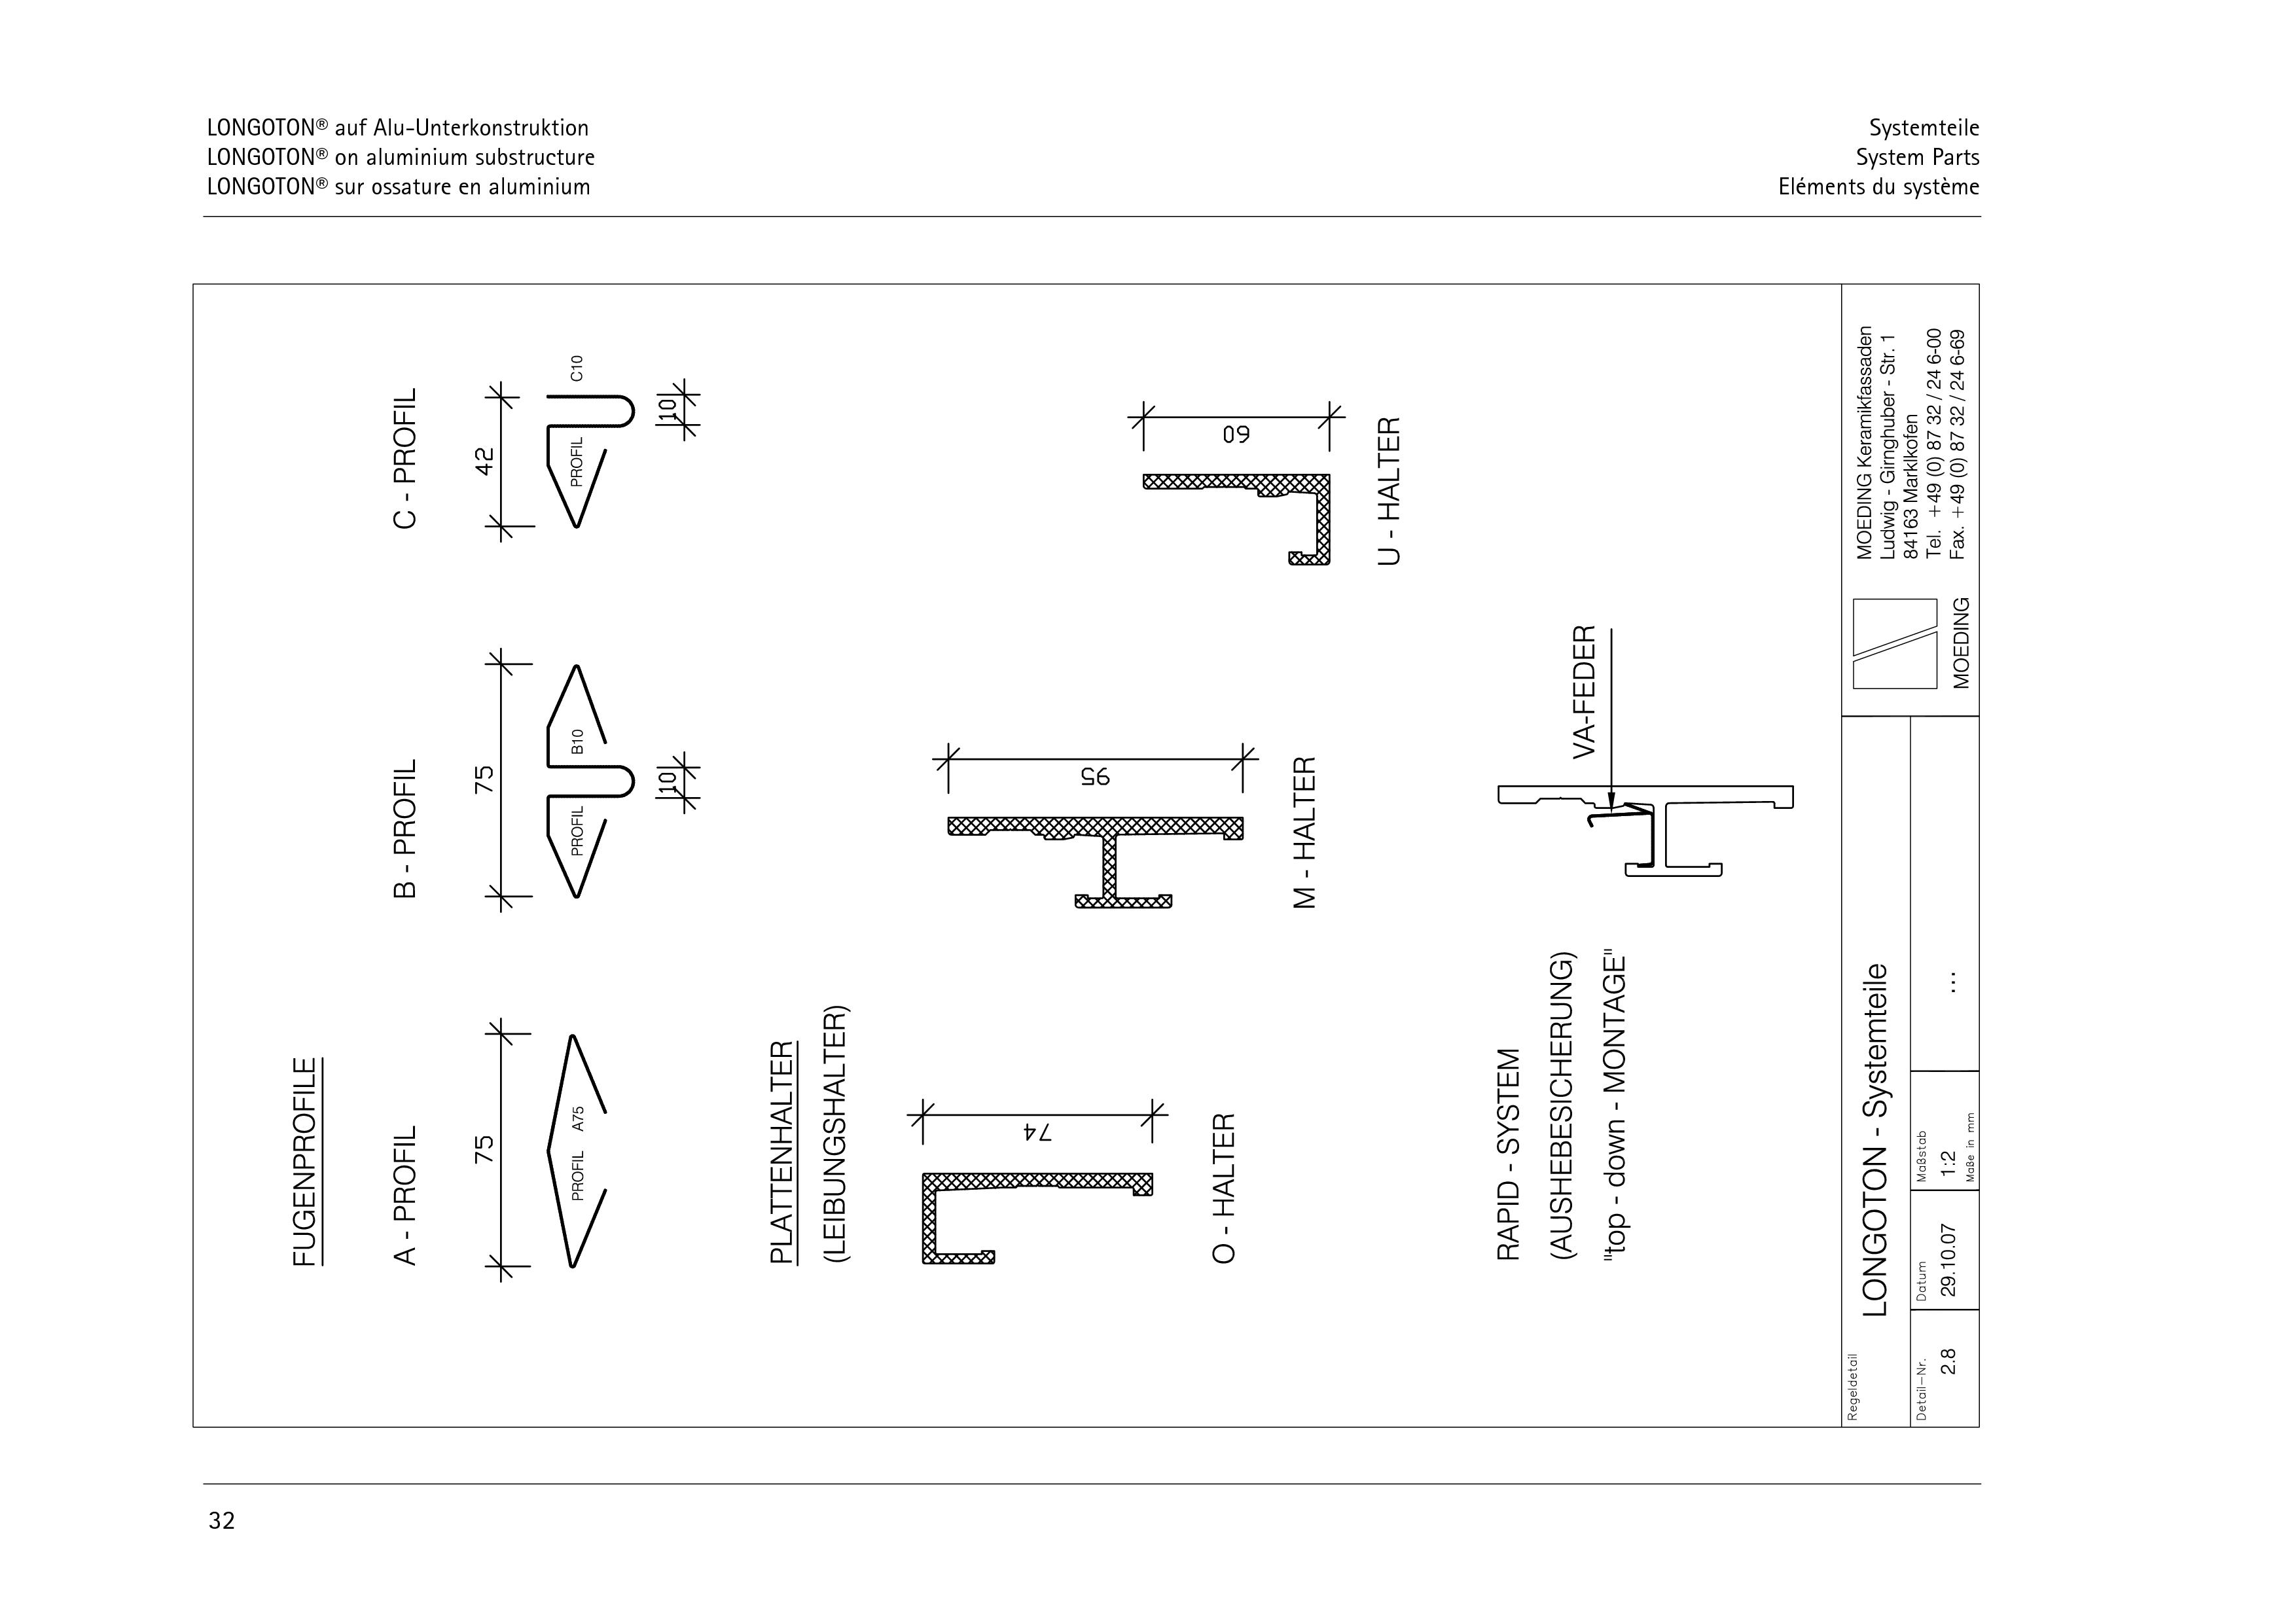 Pagina 32 - CAD-PDF Sisteme de placaje ceramice pentru fatada  ALPHATON Detaliu de montaj LONGOTON